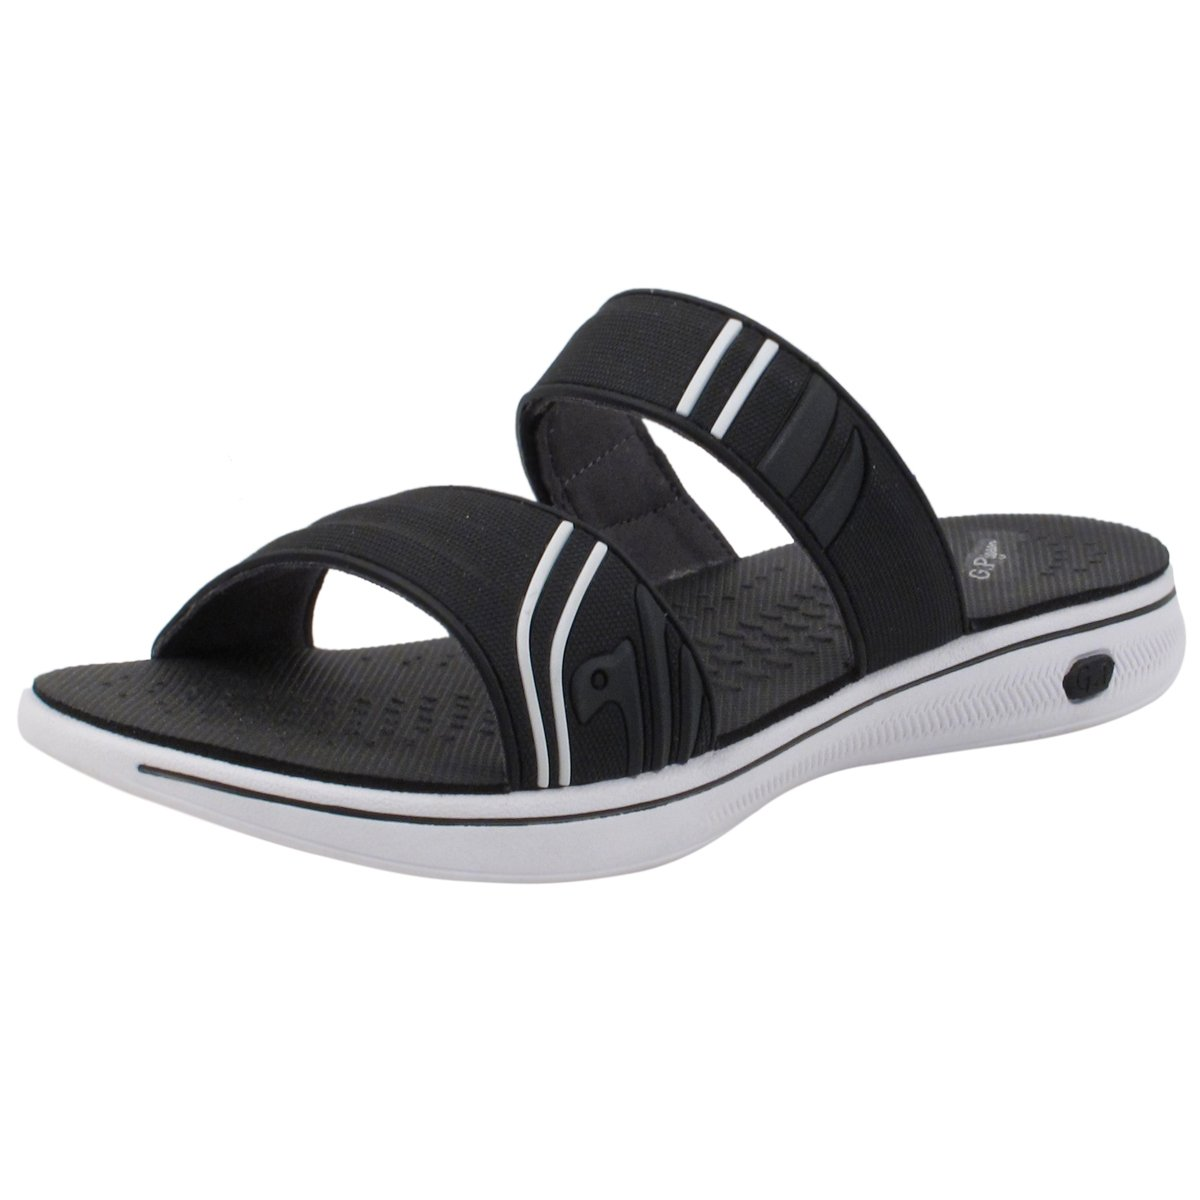 Gold Pigeon Shoes EVA Anti-Fatique Light Weight Sandals for Men & Women B07DN7ZHXY EU38: Women 6.5/7|Slide Sandal: 8589 Black White